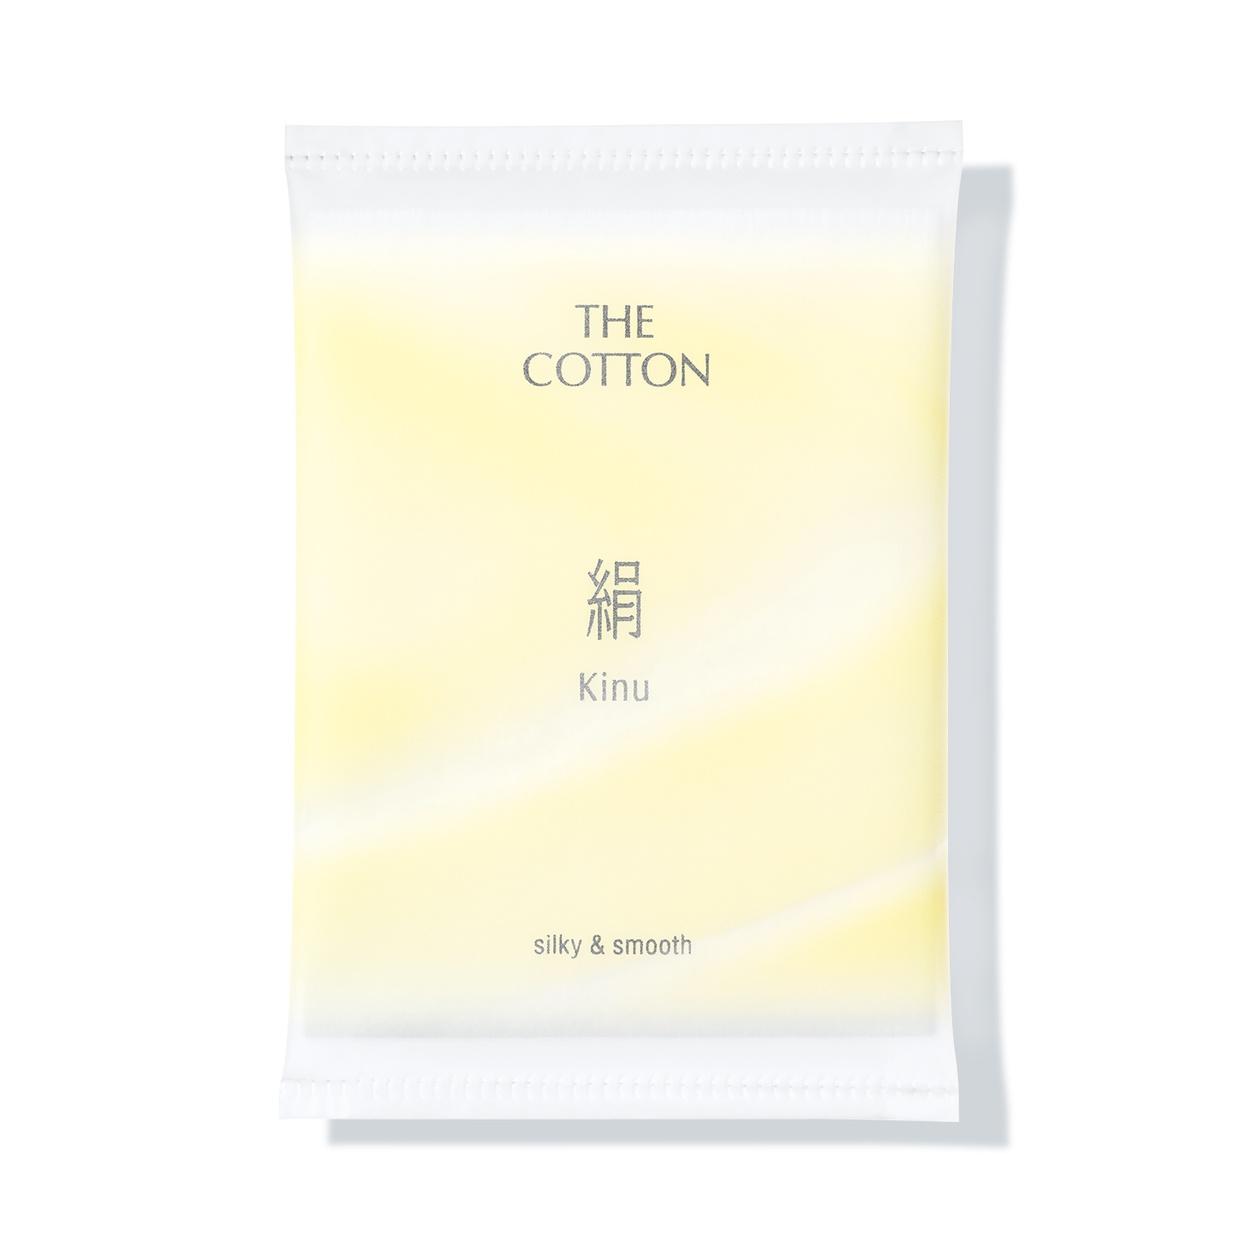 THE GINZA(ザ・ギンザ) ザ・コットン 絹